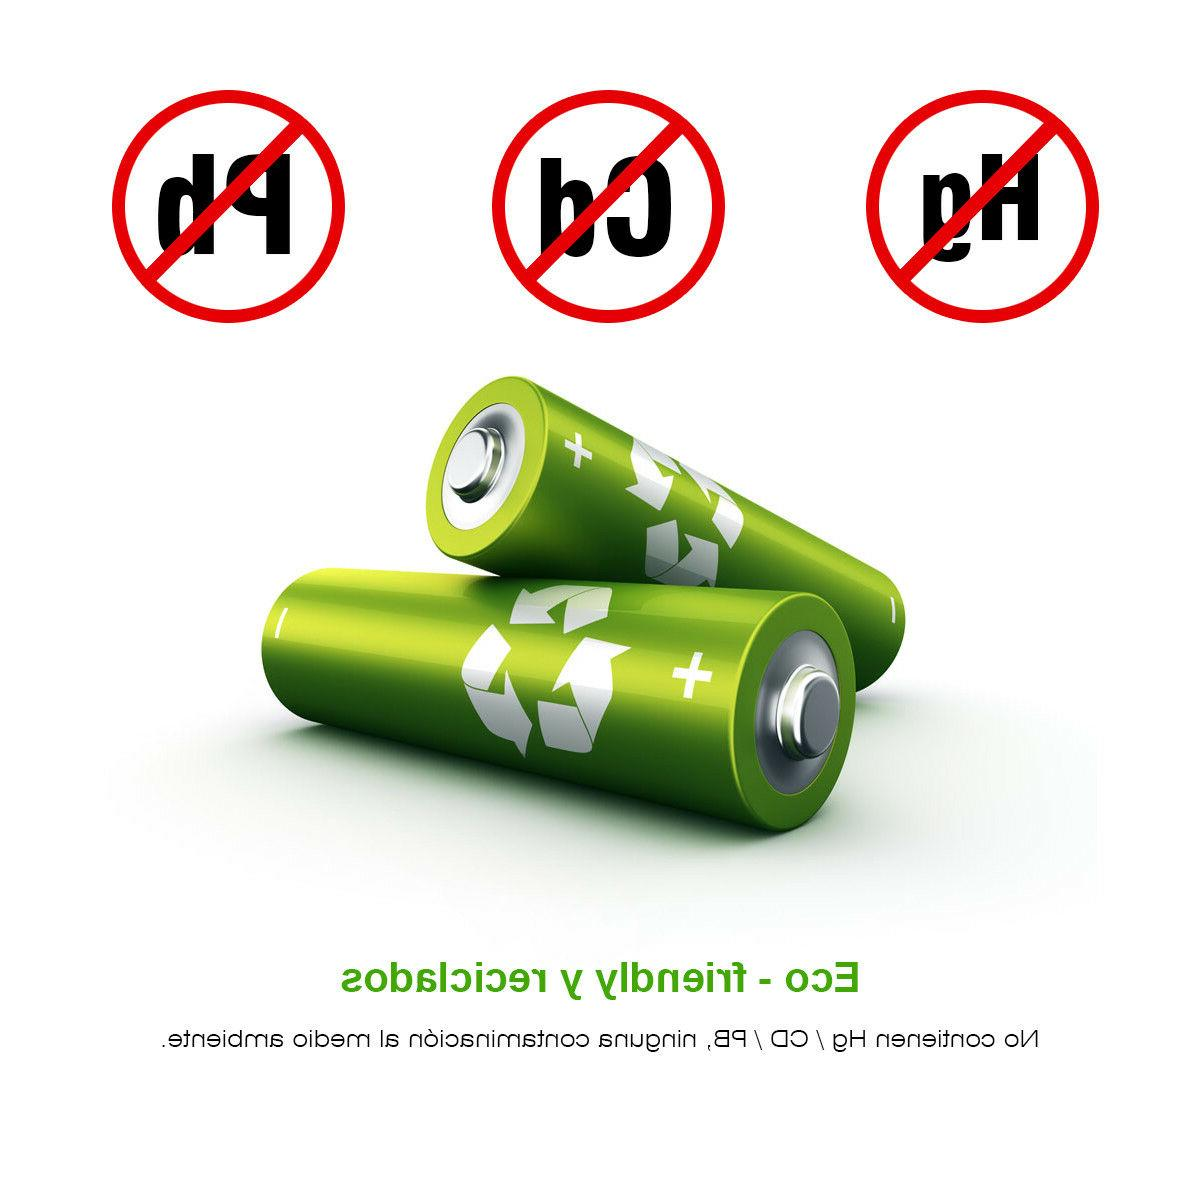 EBL Lot 2800mAh 800mAh NI-MH Rechargeable +